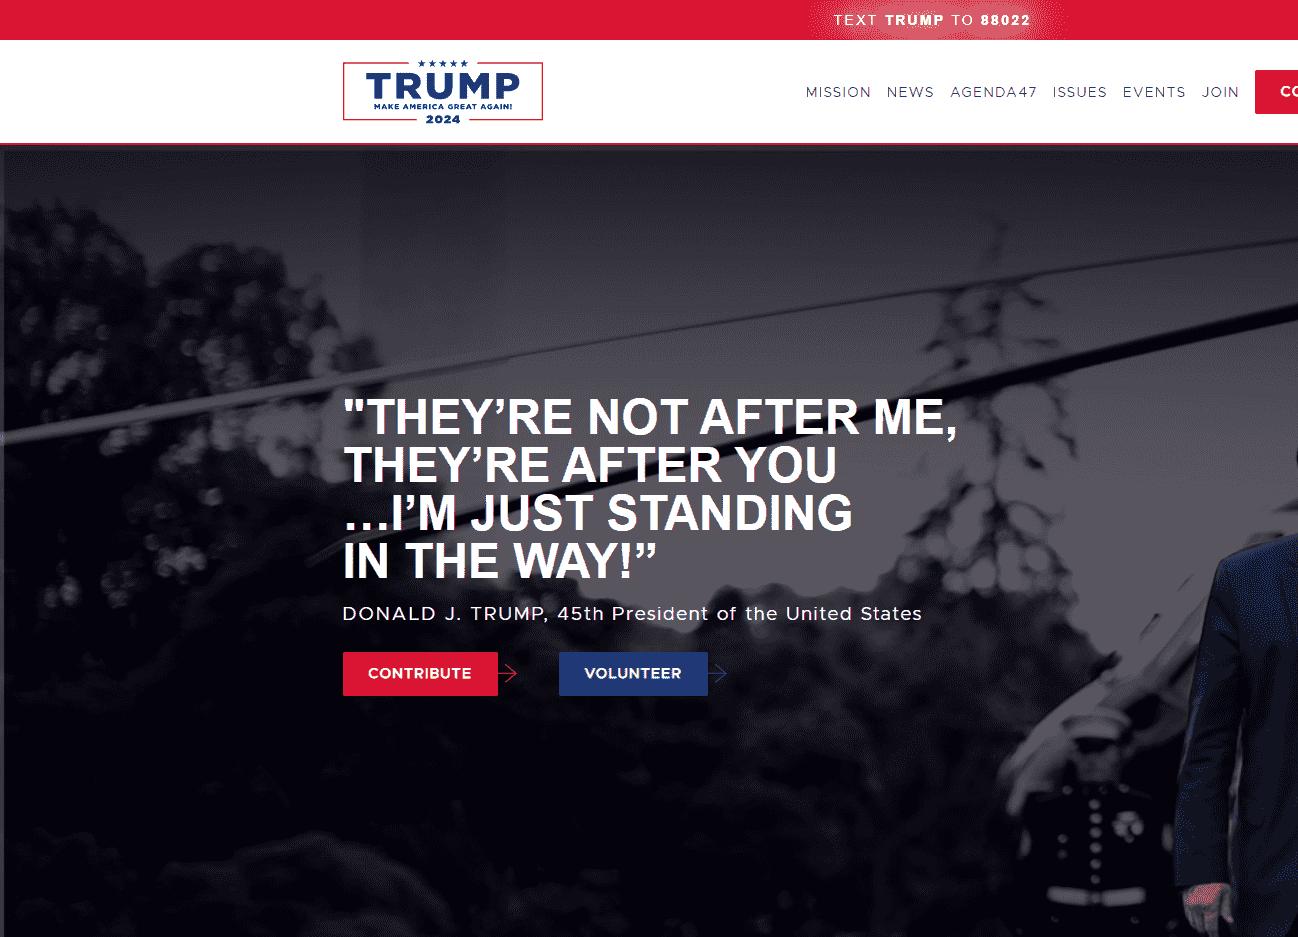 Donald Trump reviews and complaints